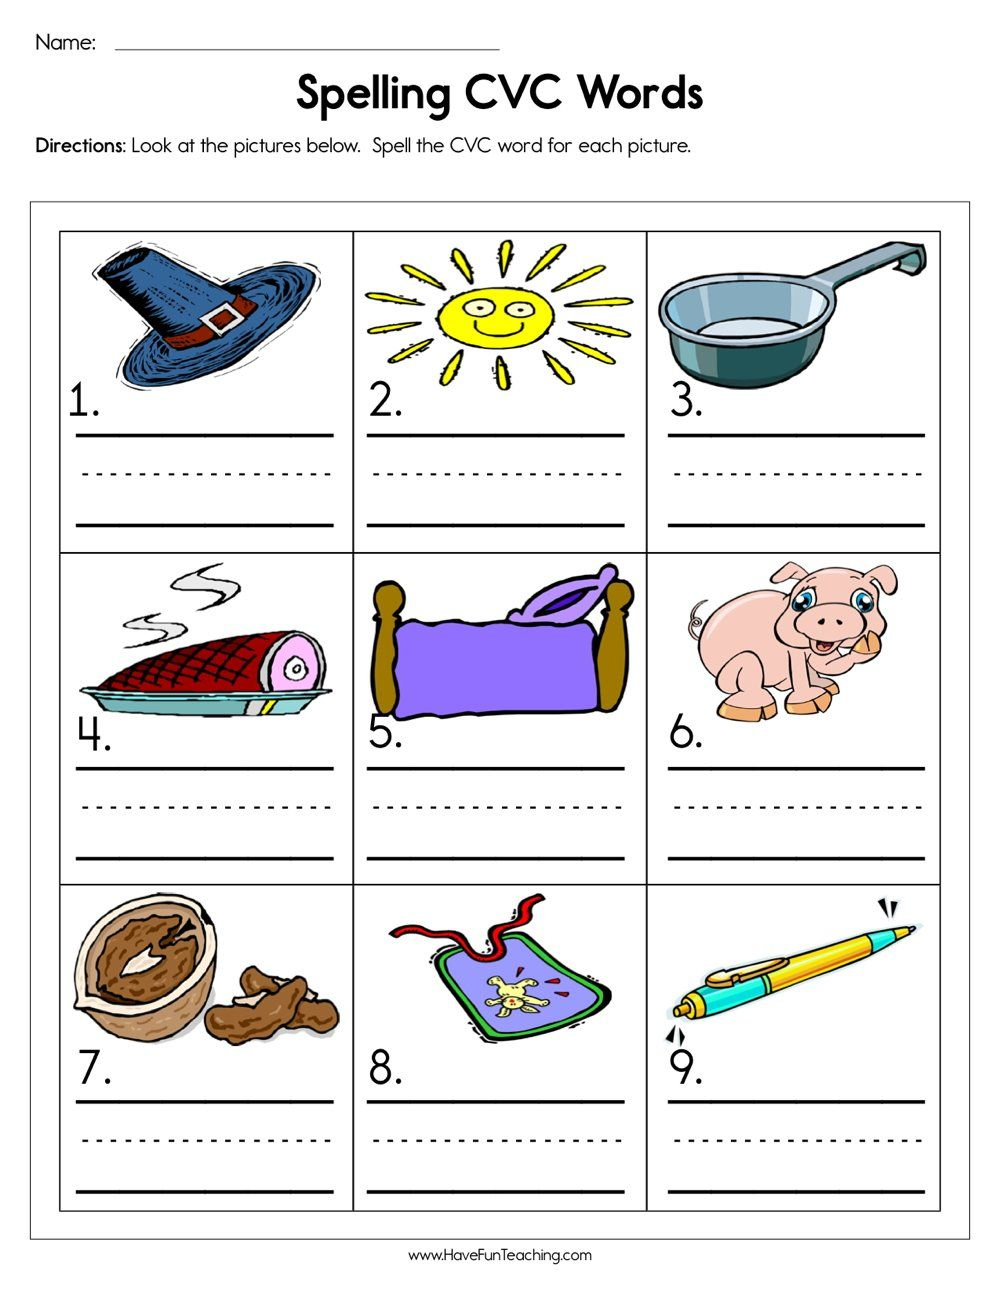 Spelling Cvc Words Worksheet Cvc Words Worksheets Spelling Cvc Words Cvc Words [ 1294 x 1000 Pixel ]